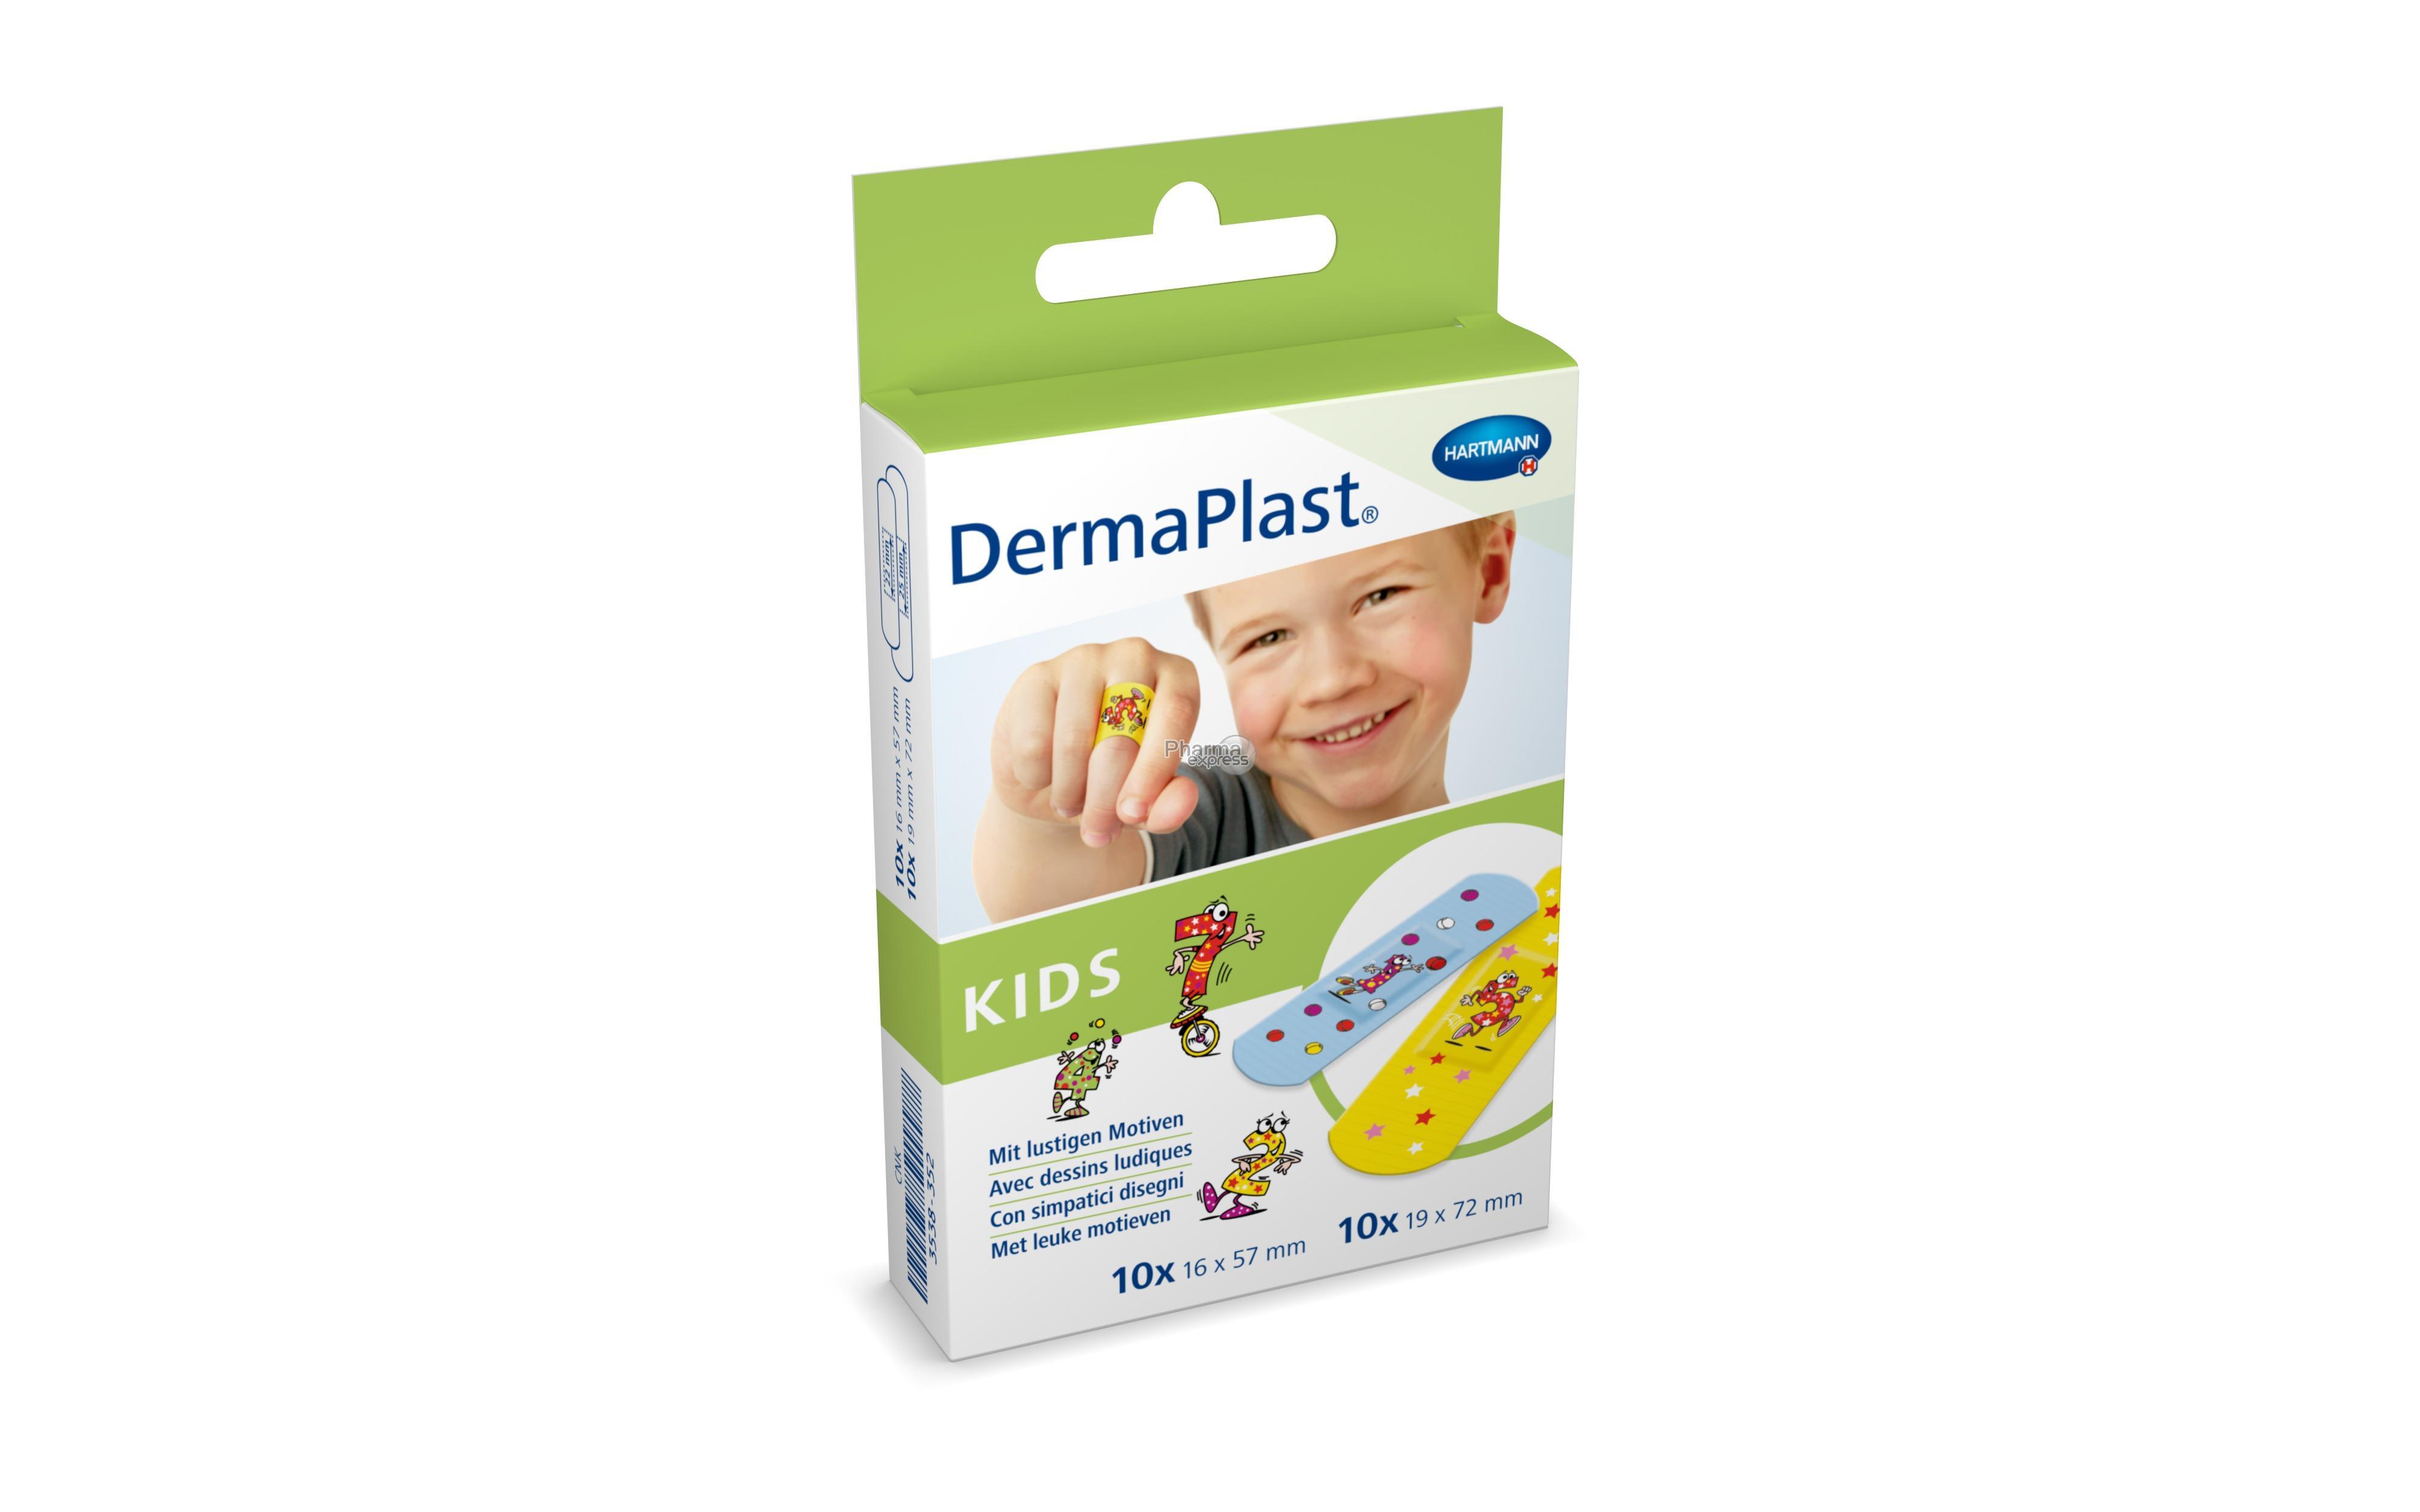 Dermaplast kids per 20 stuks